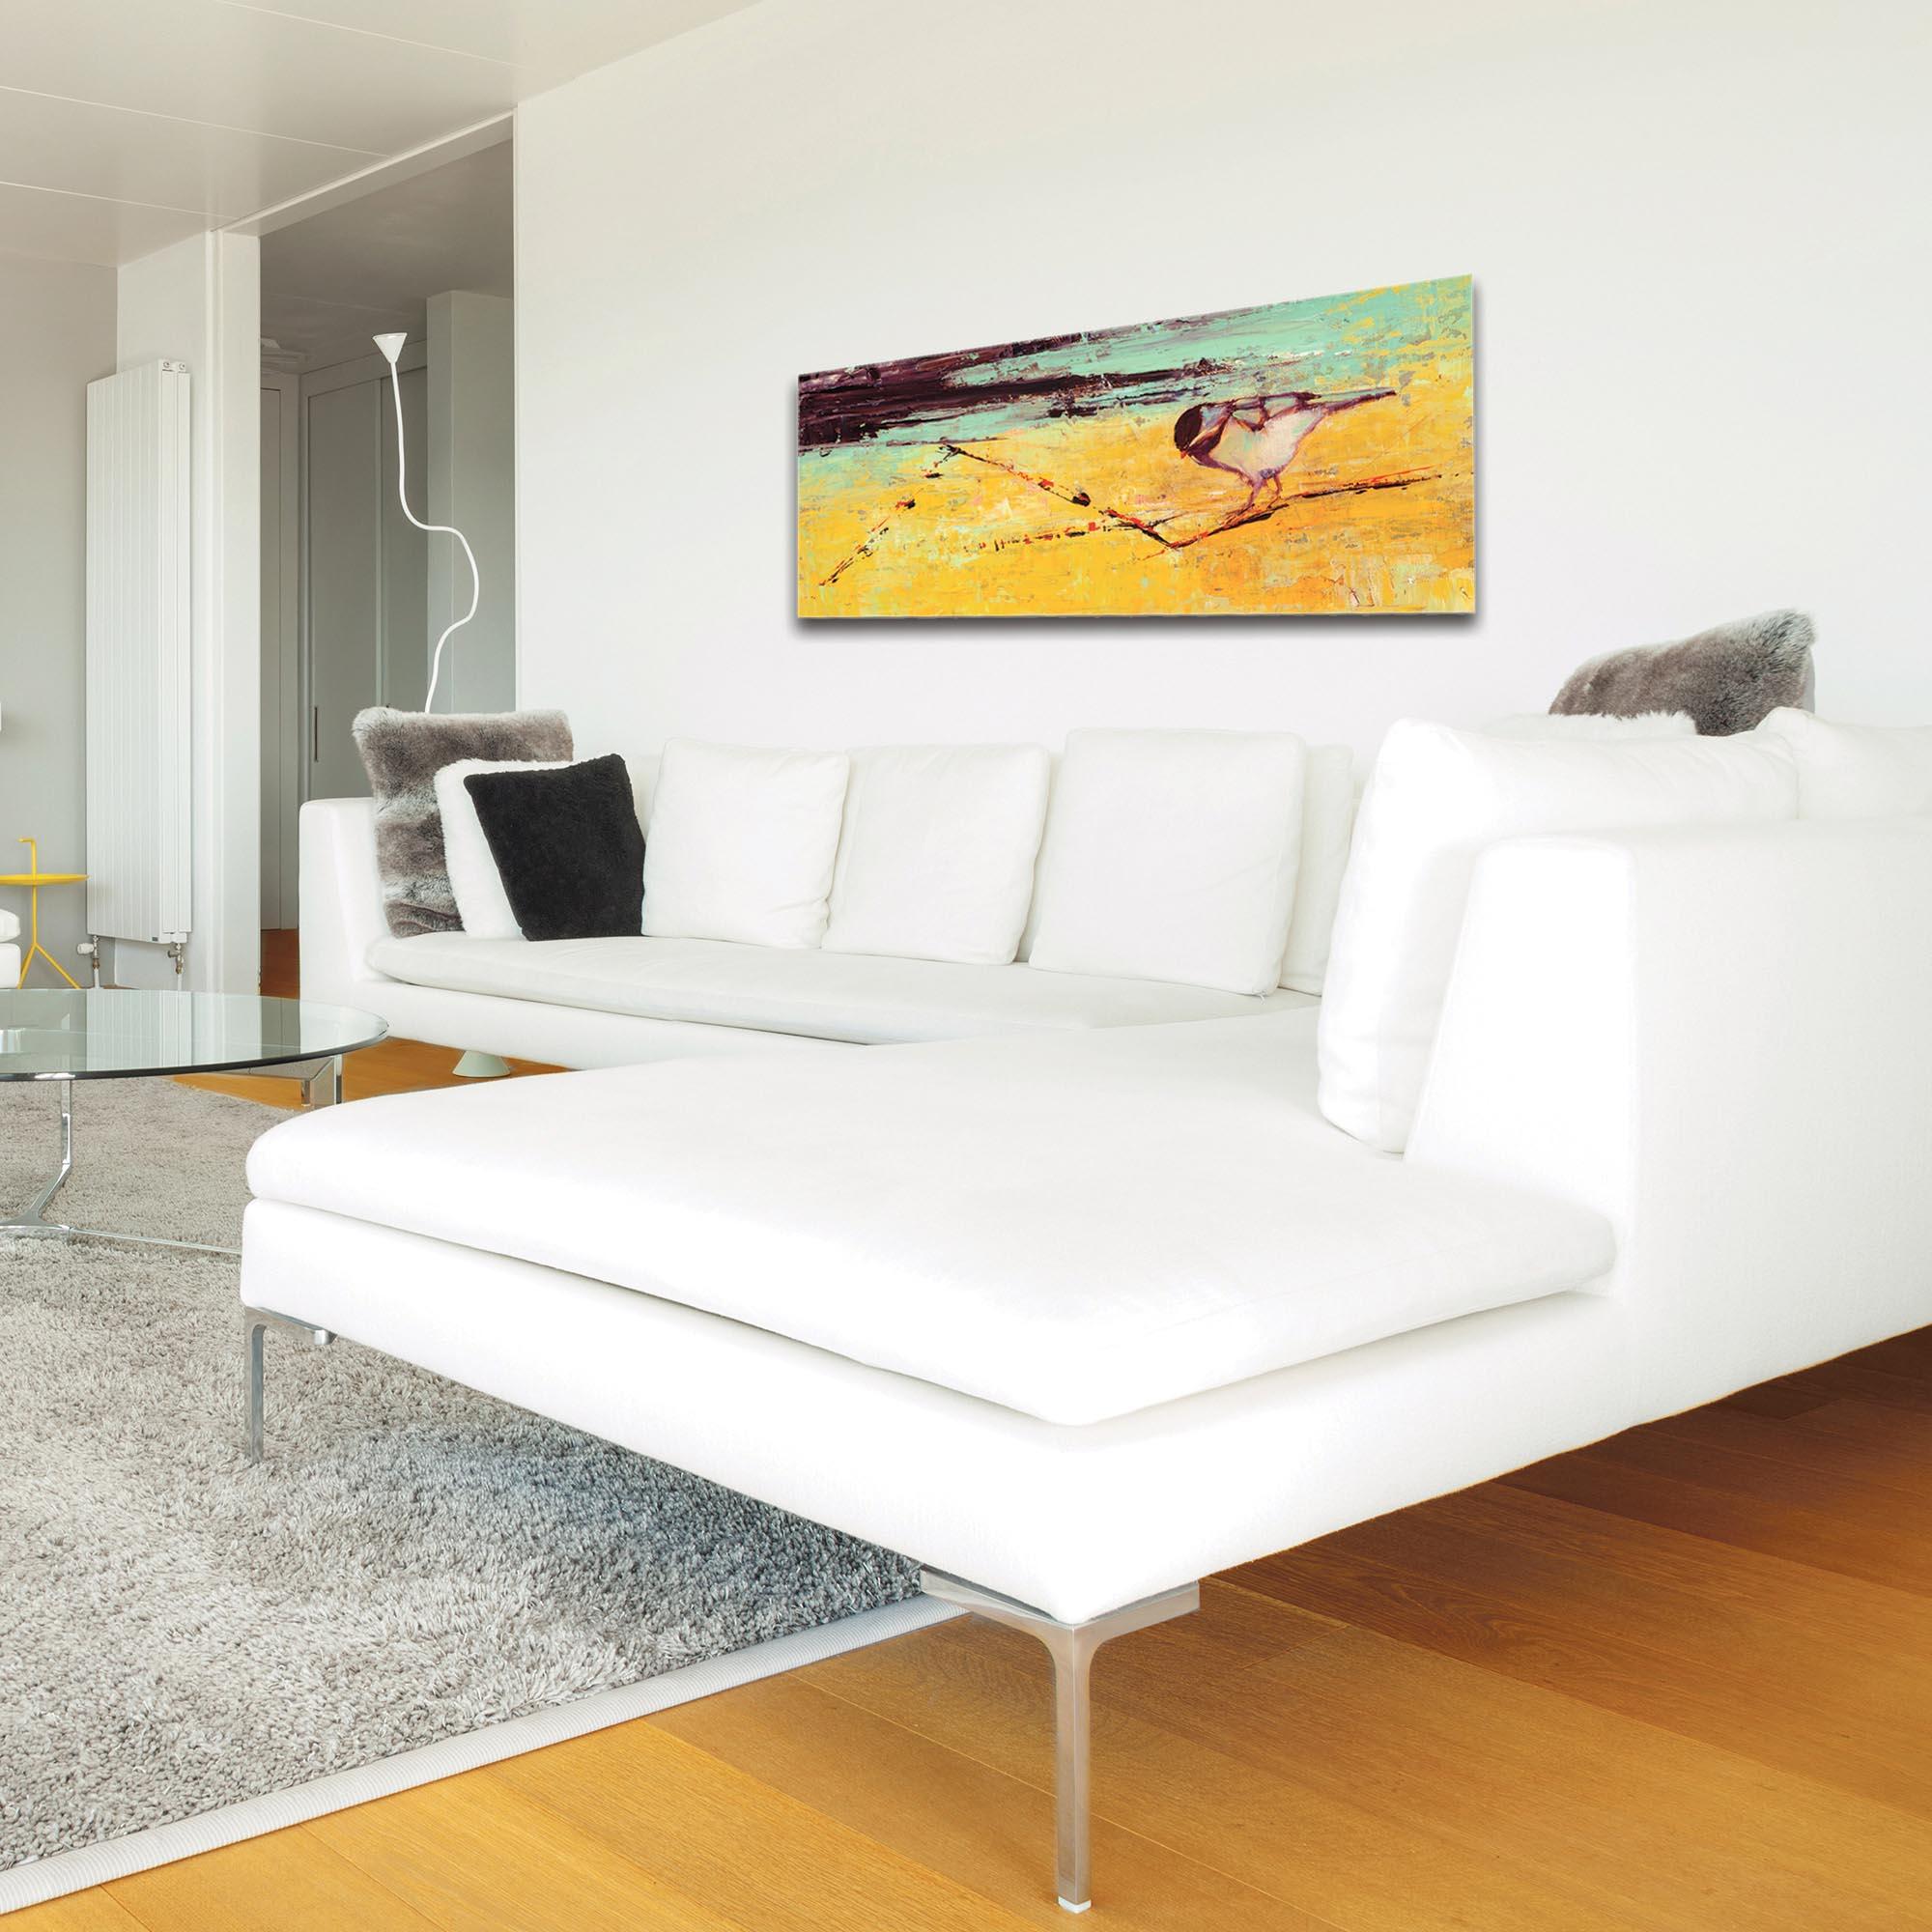 Contemporary Wall Art 'Bird on a Horizon v2' - Urban Birds Decor on Metal or Plexiglass - Image 3